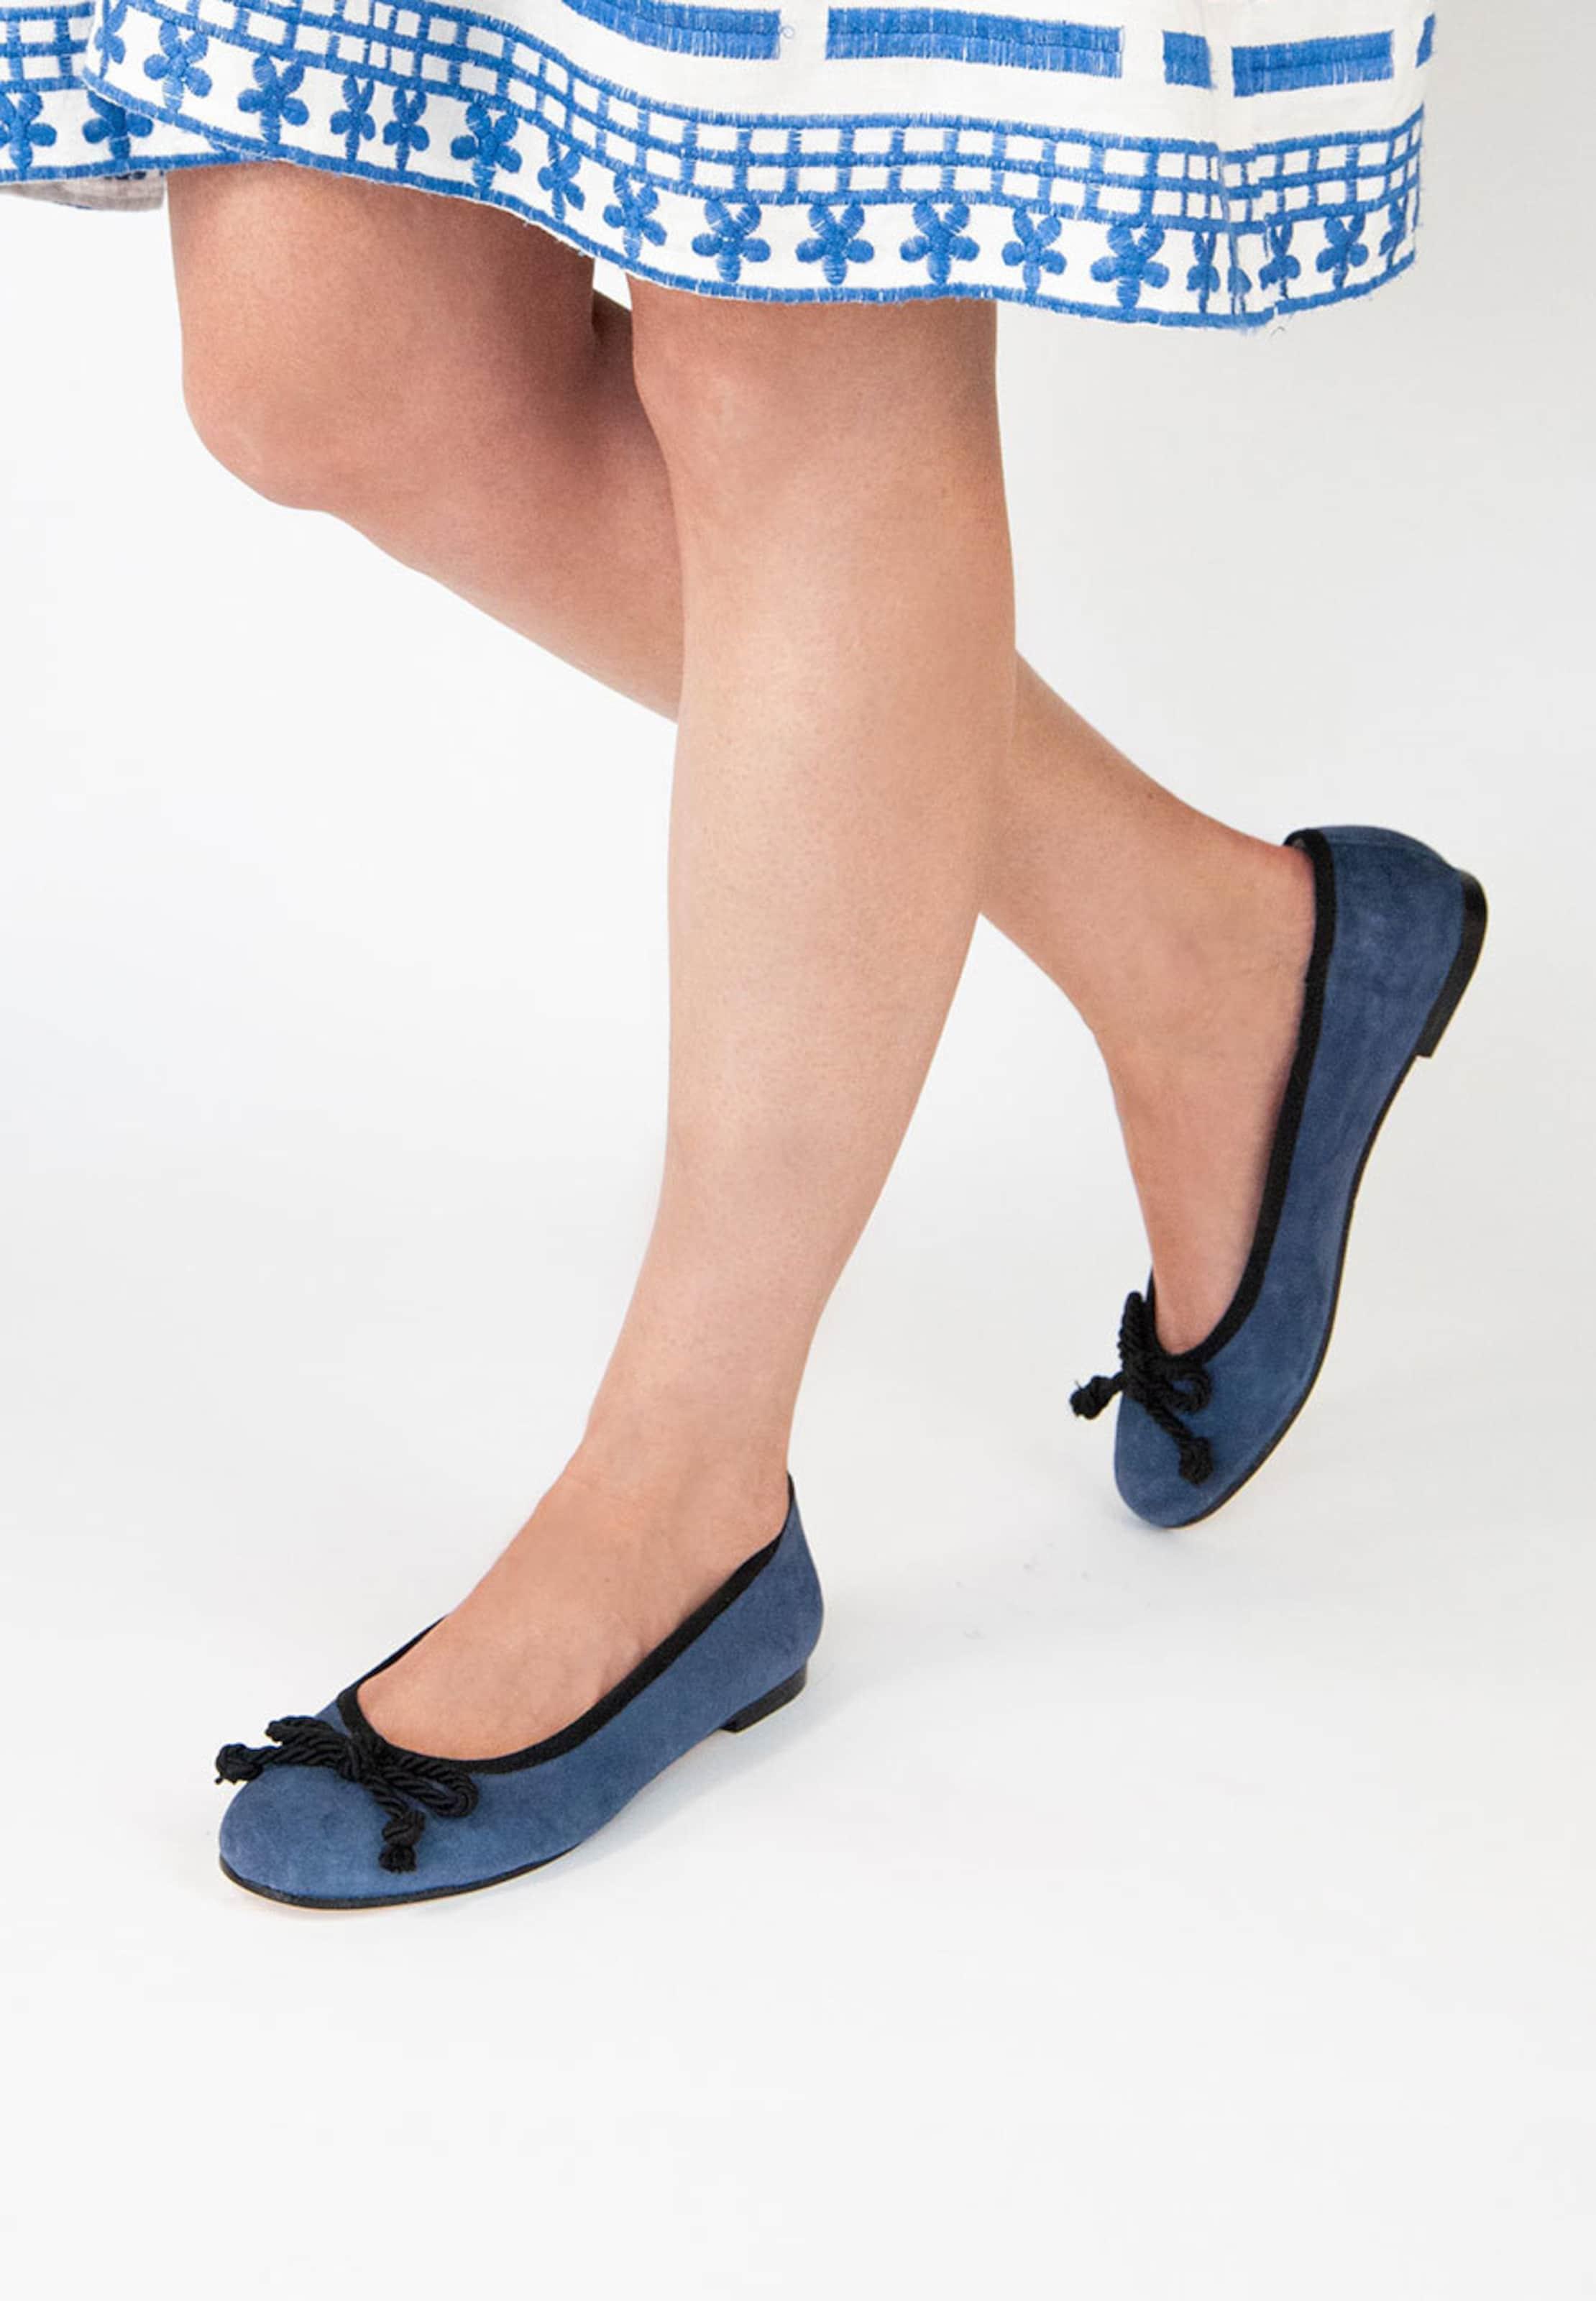 Ballerinas 'millie' In Crickit Denim BlauBlue yn0wPNvmO8